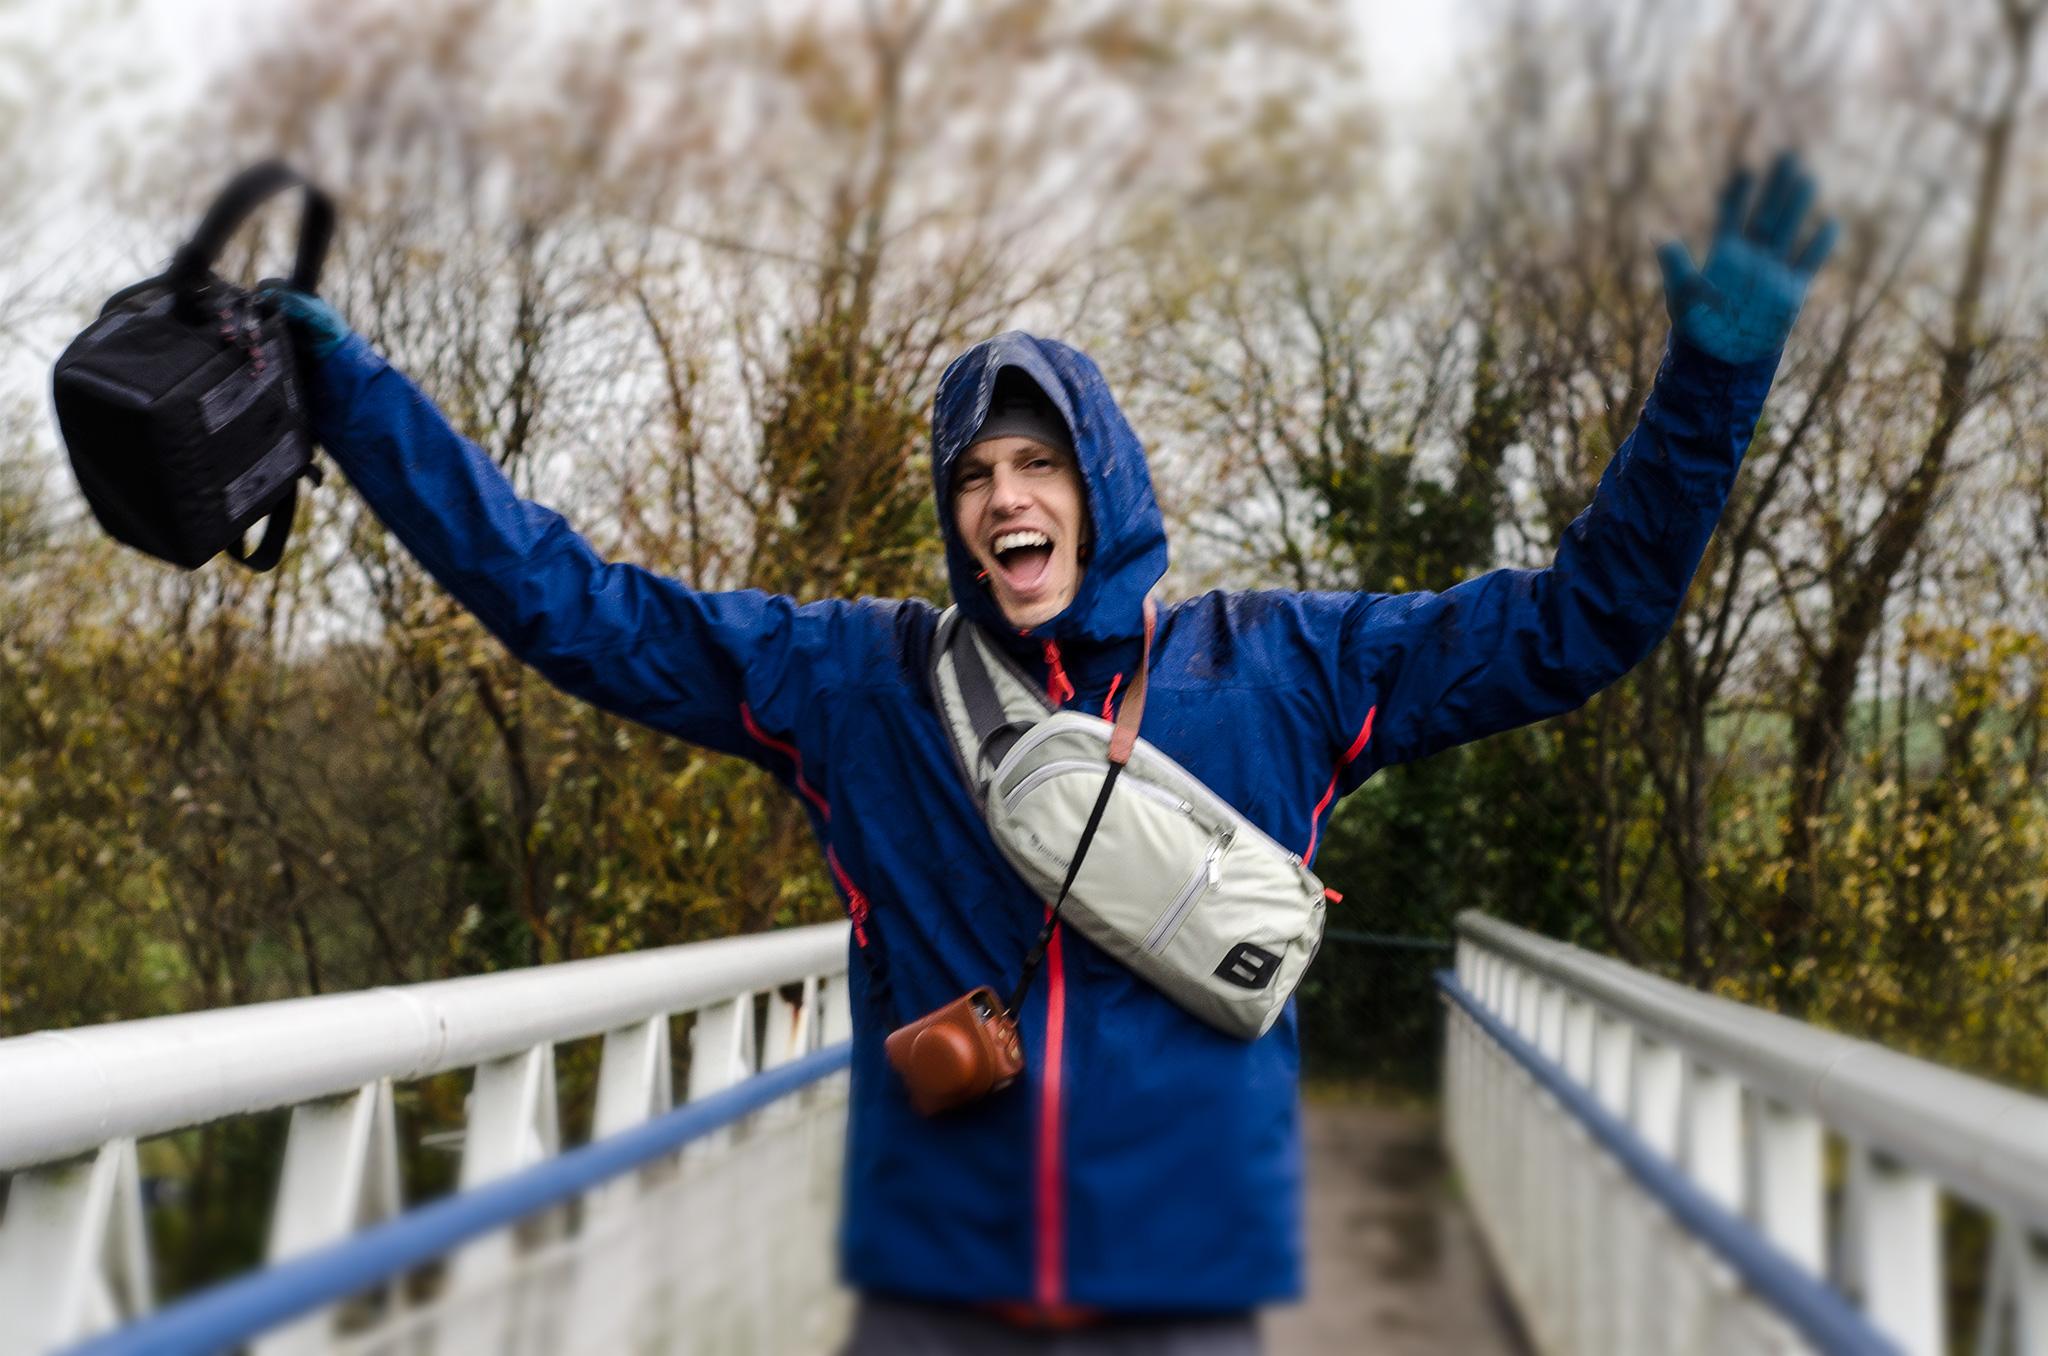 mike bowen at new grange rain soaked